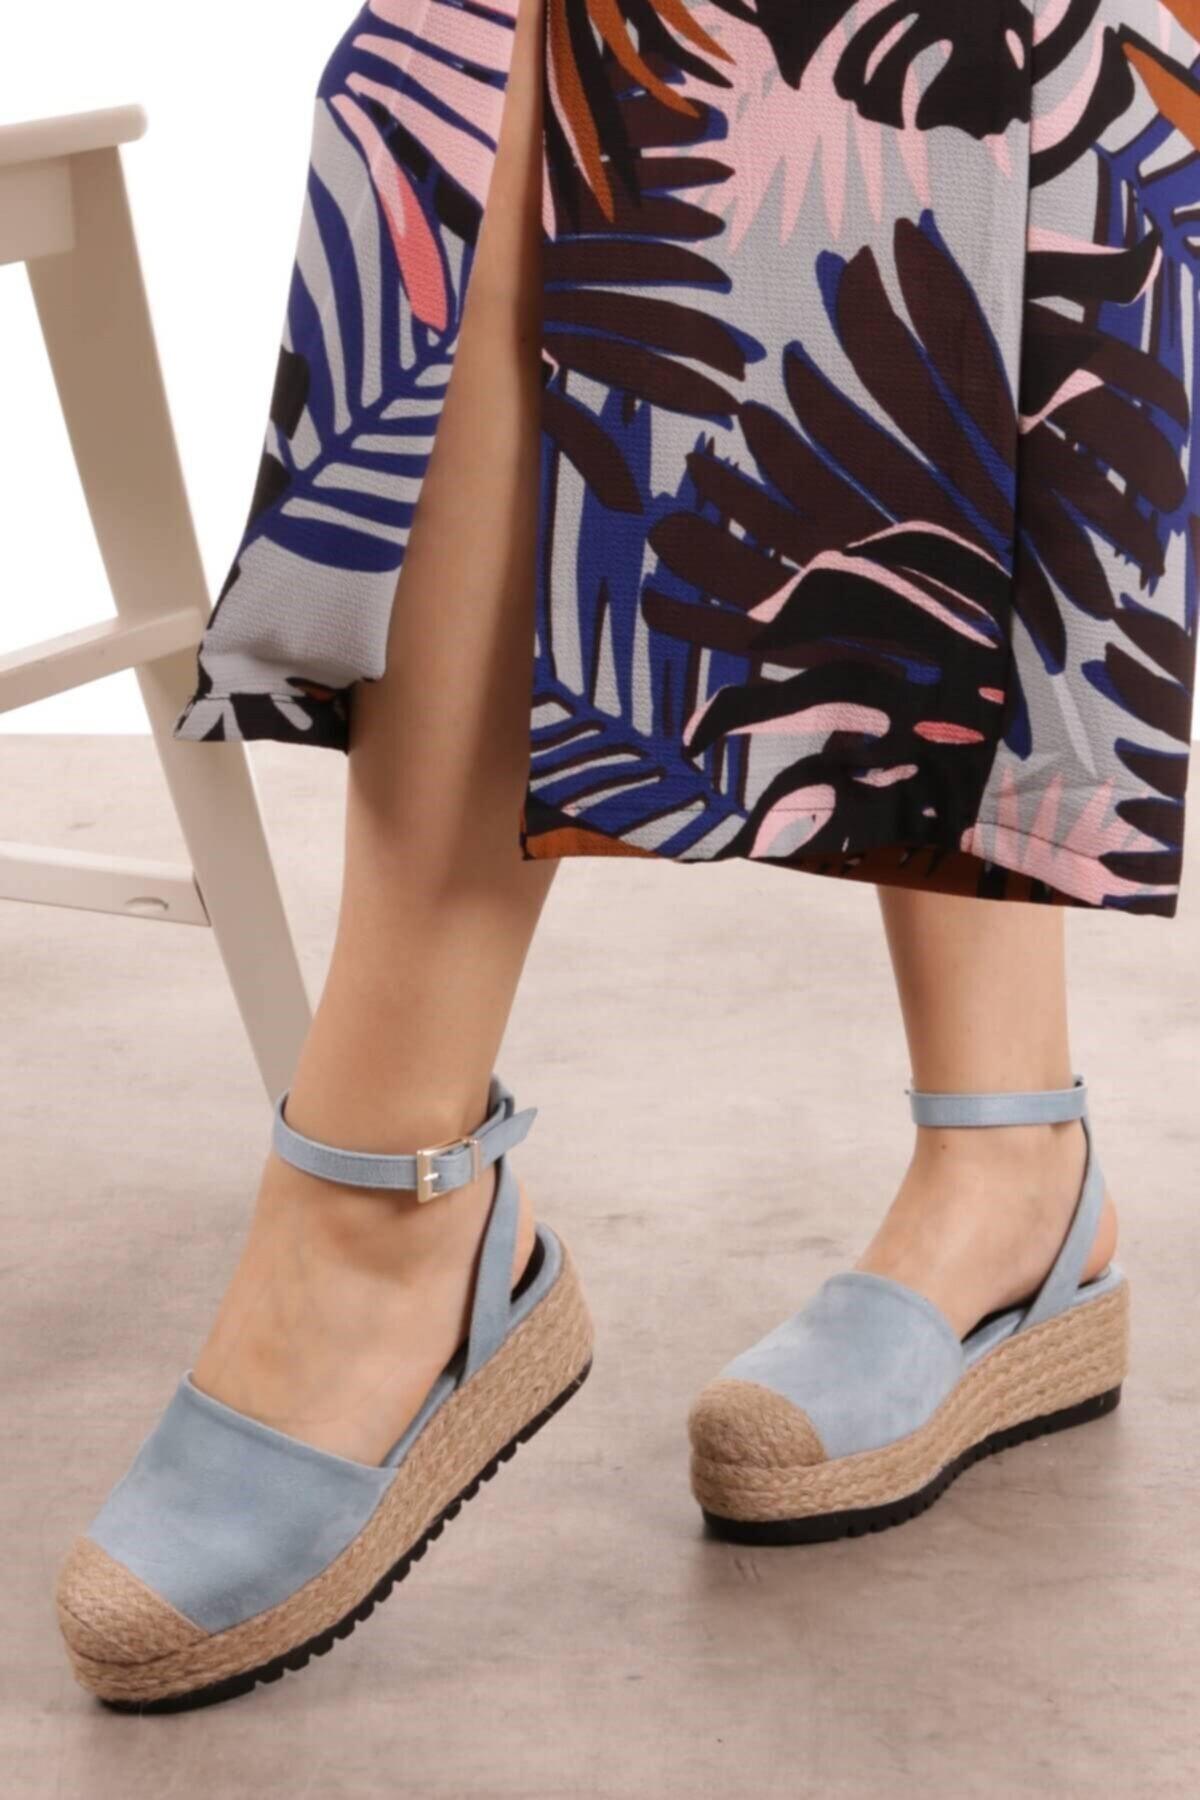 Mio Gusto Janet Mavi Dolgu Tabanlı Sandalet 1